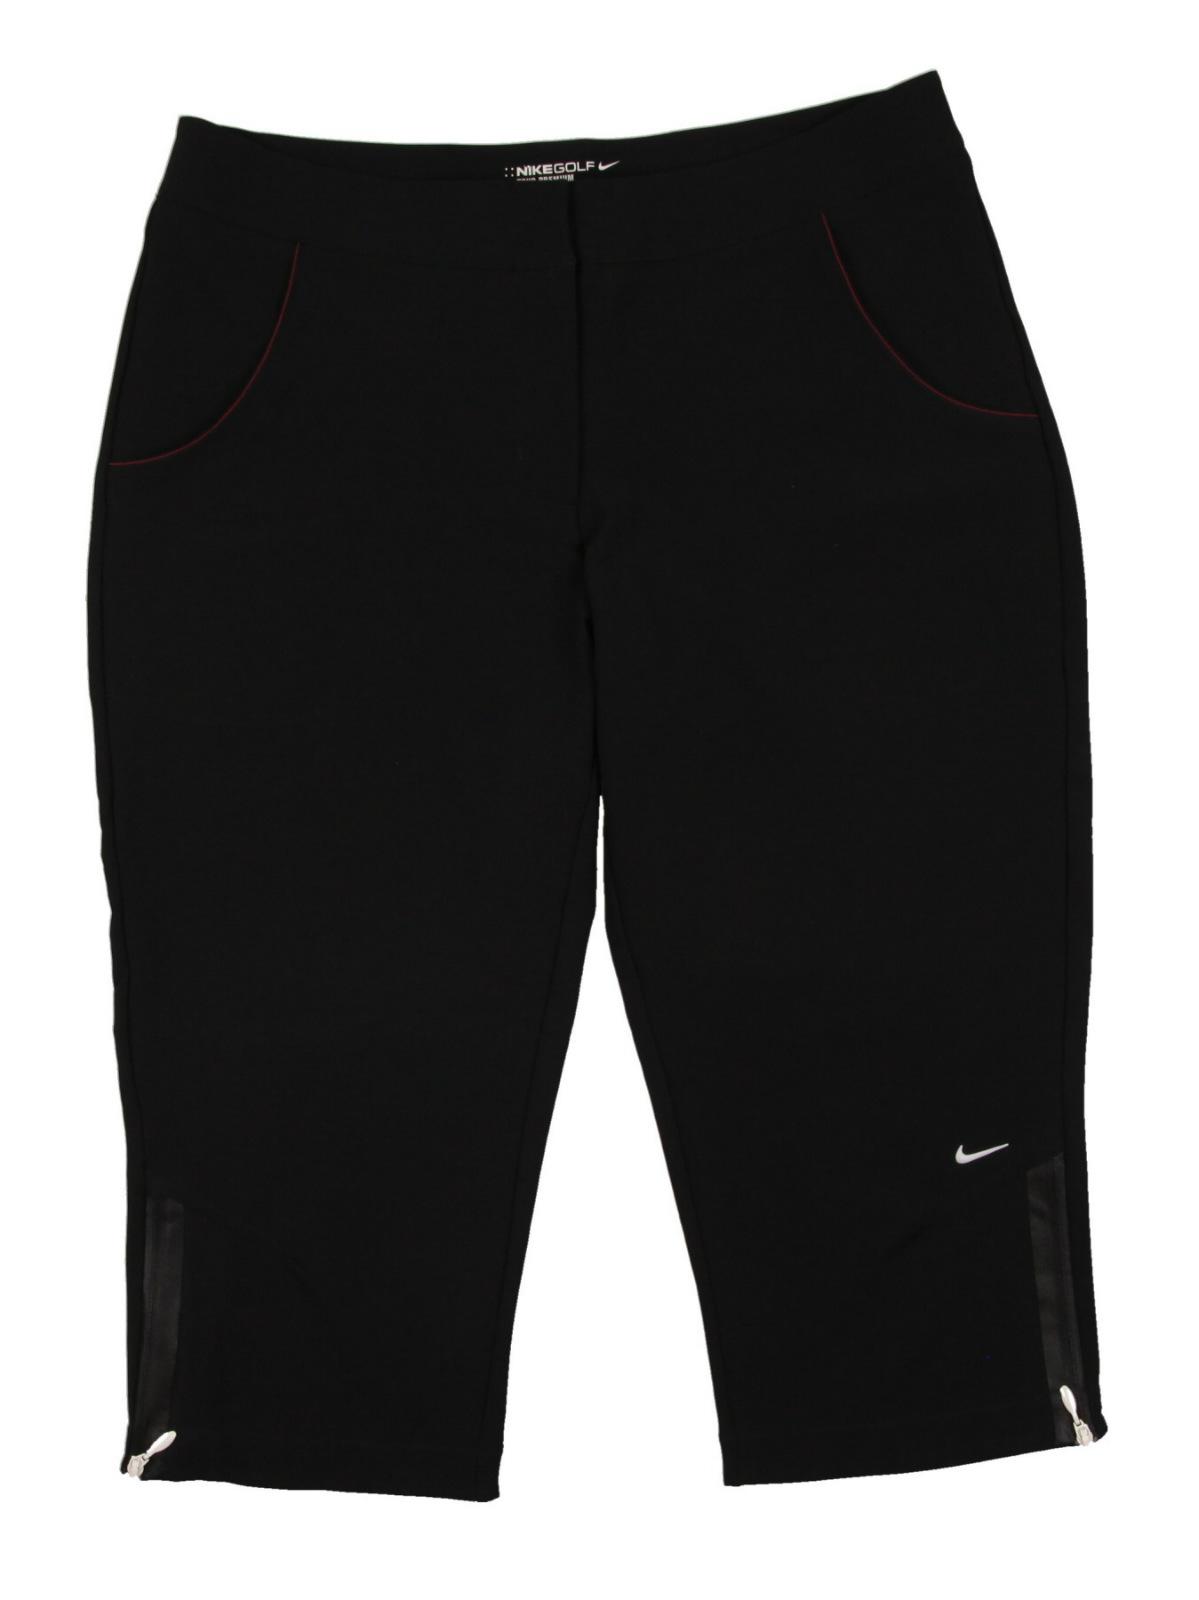 Perfect $110 New Nike Golf Womens Capris Long Slim Shorts Pants Crops 509313 060 SZ 2 | EBay